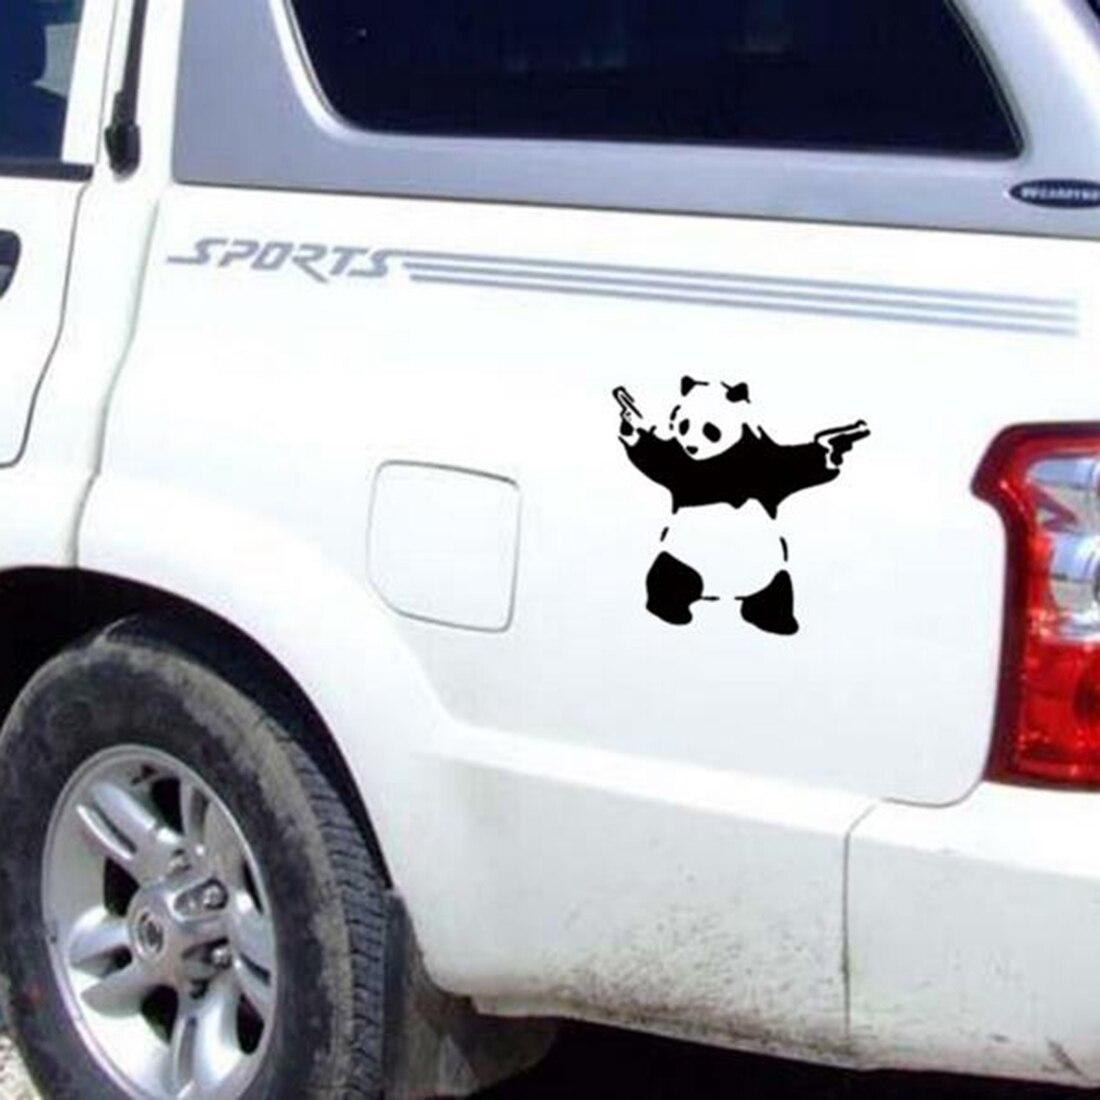 Cute car sticker designs - Fashion Cute Car Art Panda Car Sticker Decals Waterproof Car Decal On Door Carved Car Styling Stickers Free Shipping